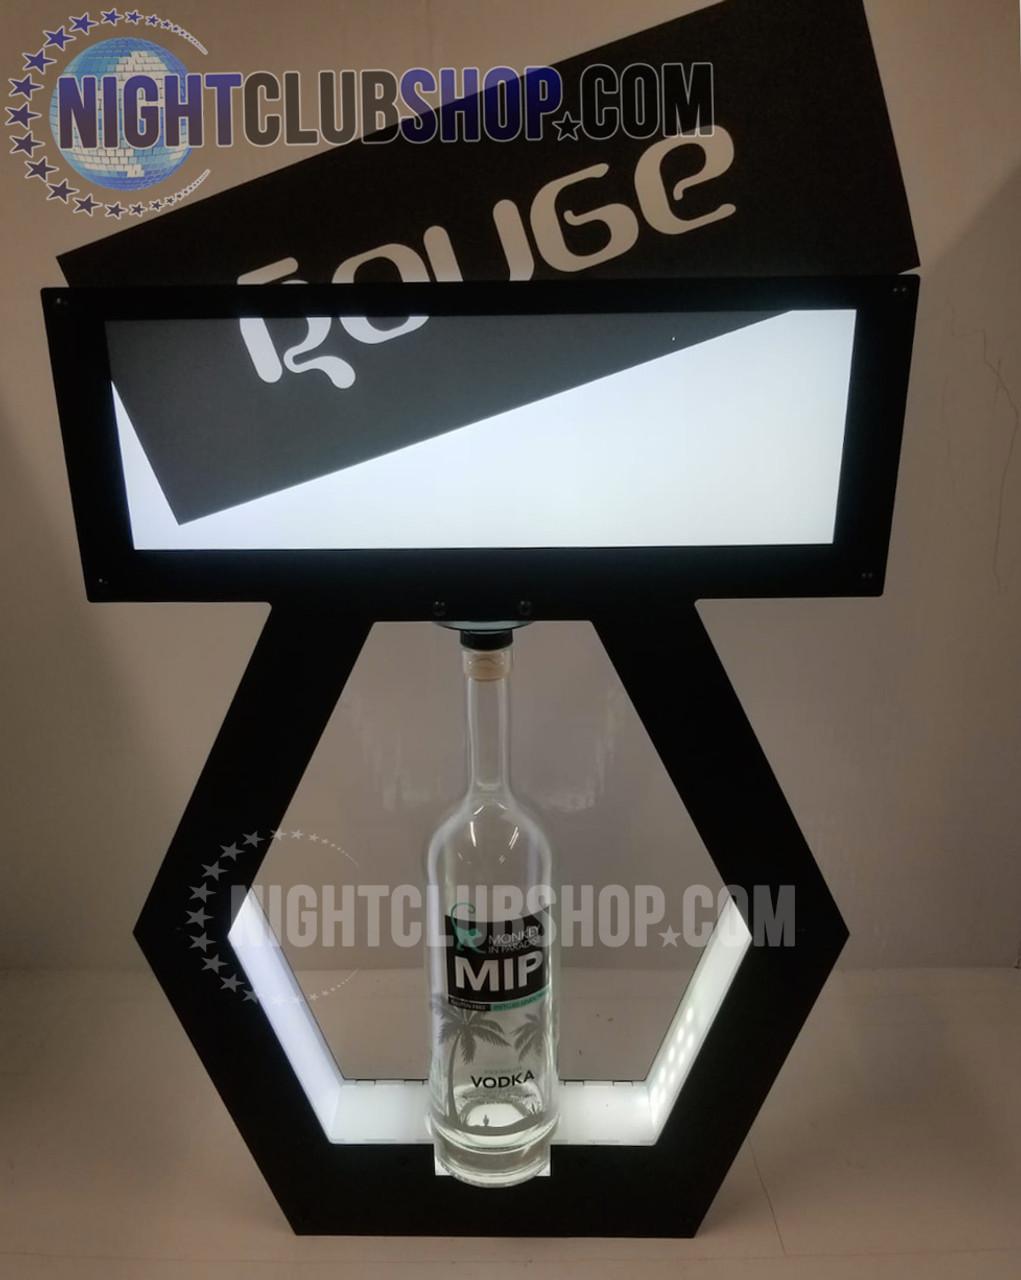 VIP,Banner,Top,interchangeable,Tray,Lightbox,Light up,Print,Banner Top,Bottle Service,tray,Presenter,change, display,shield,nightclubshop